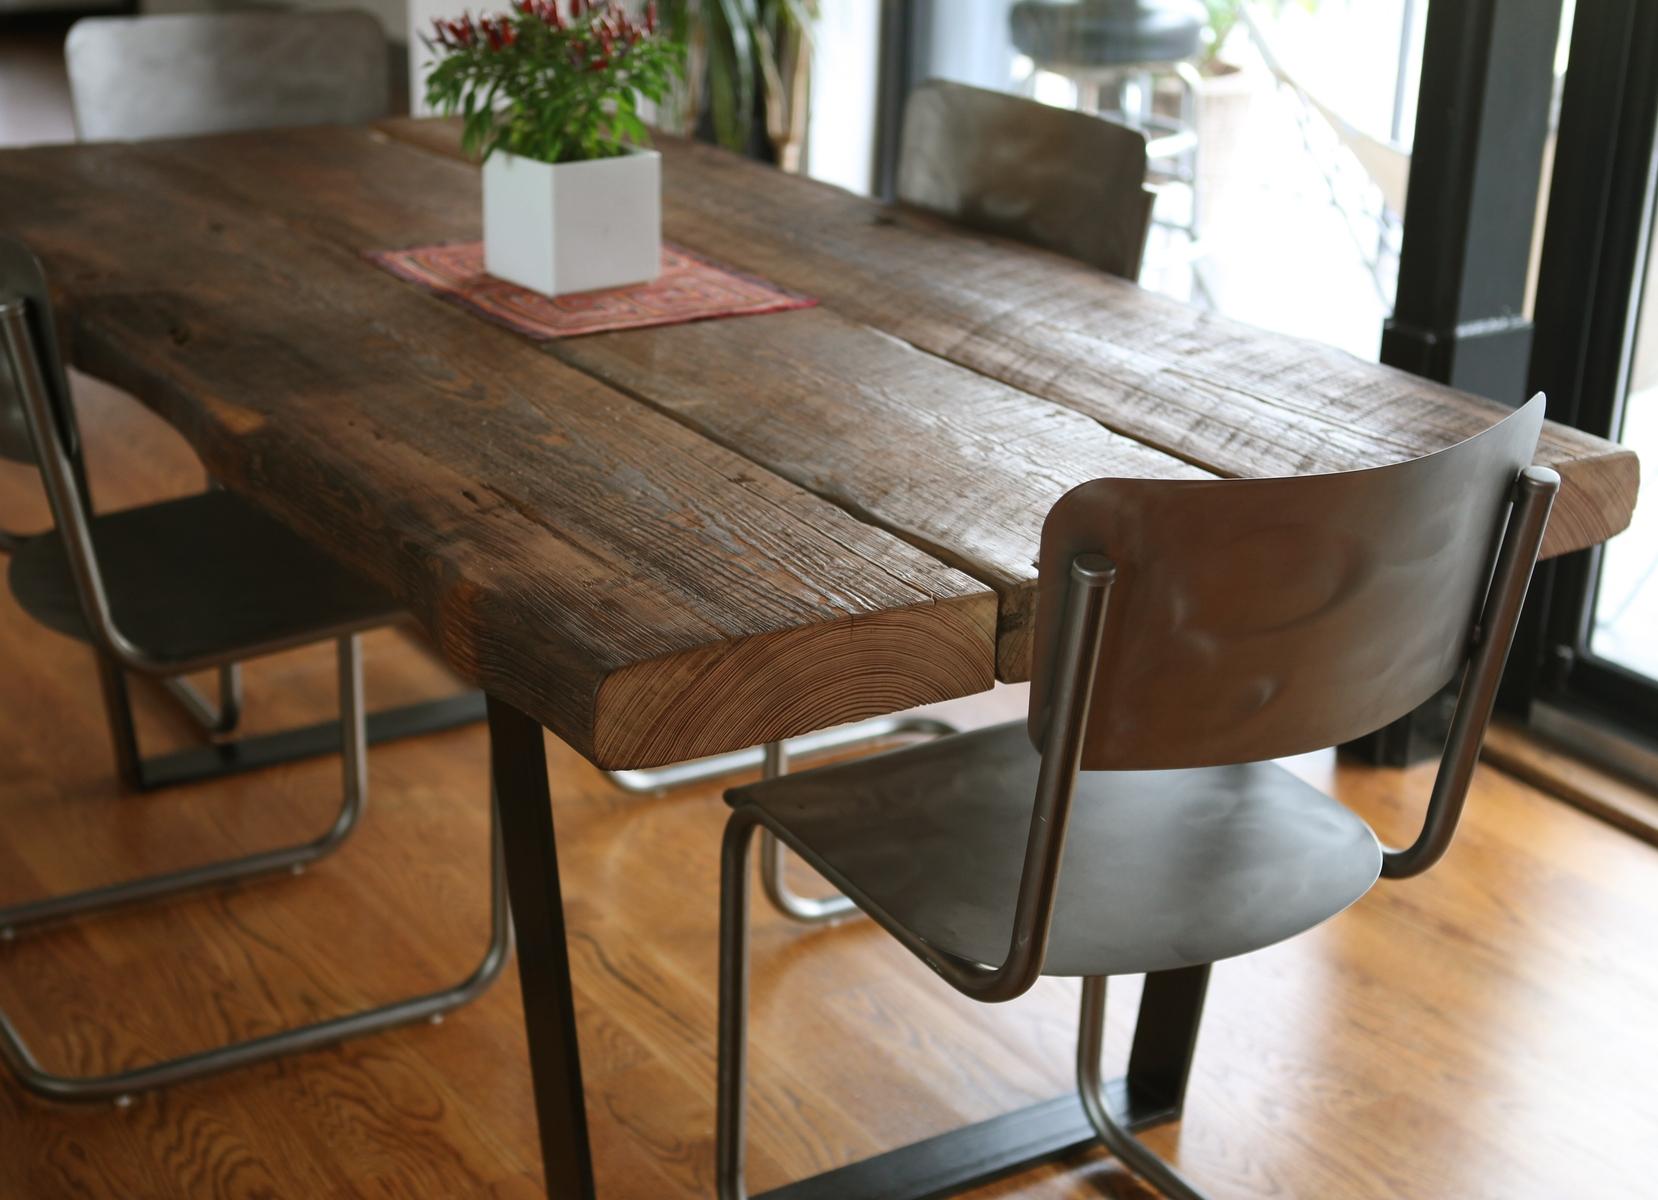 Meet Stephen Muscarella: Reclaimed Wood Creations